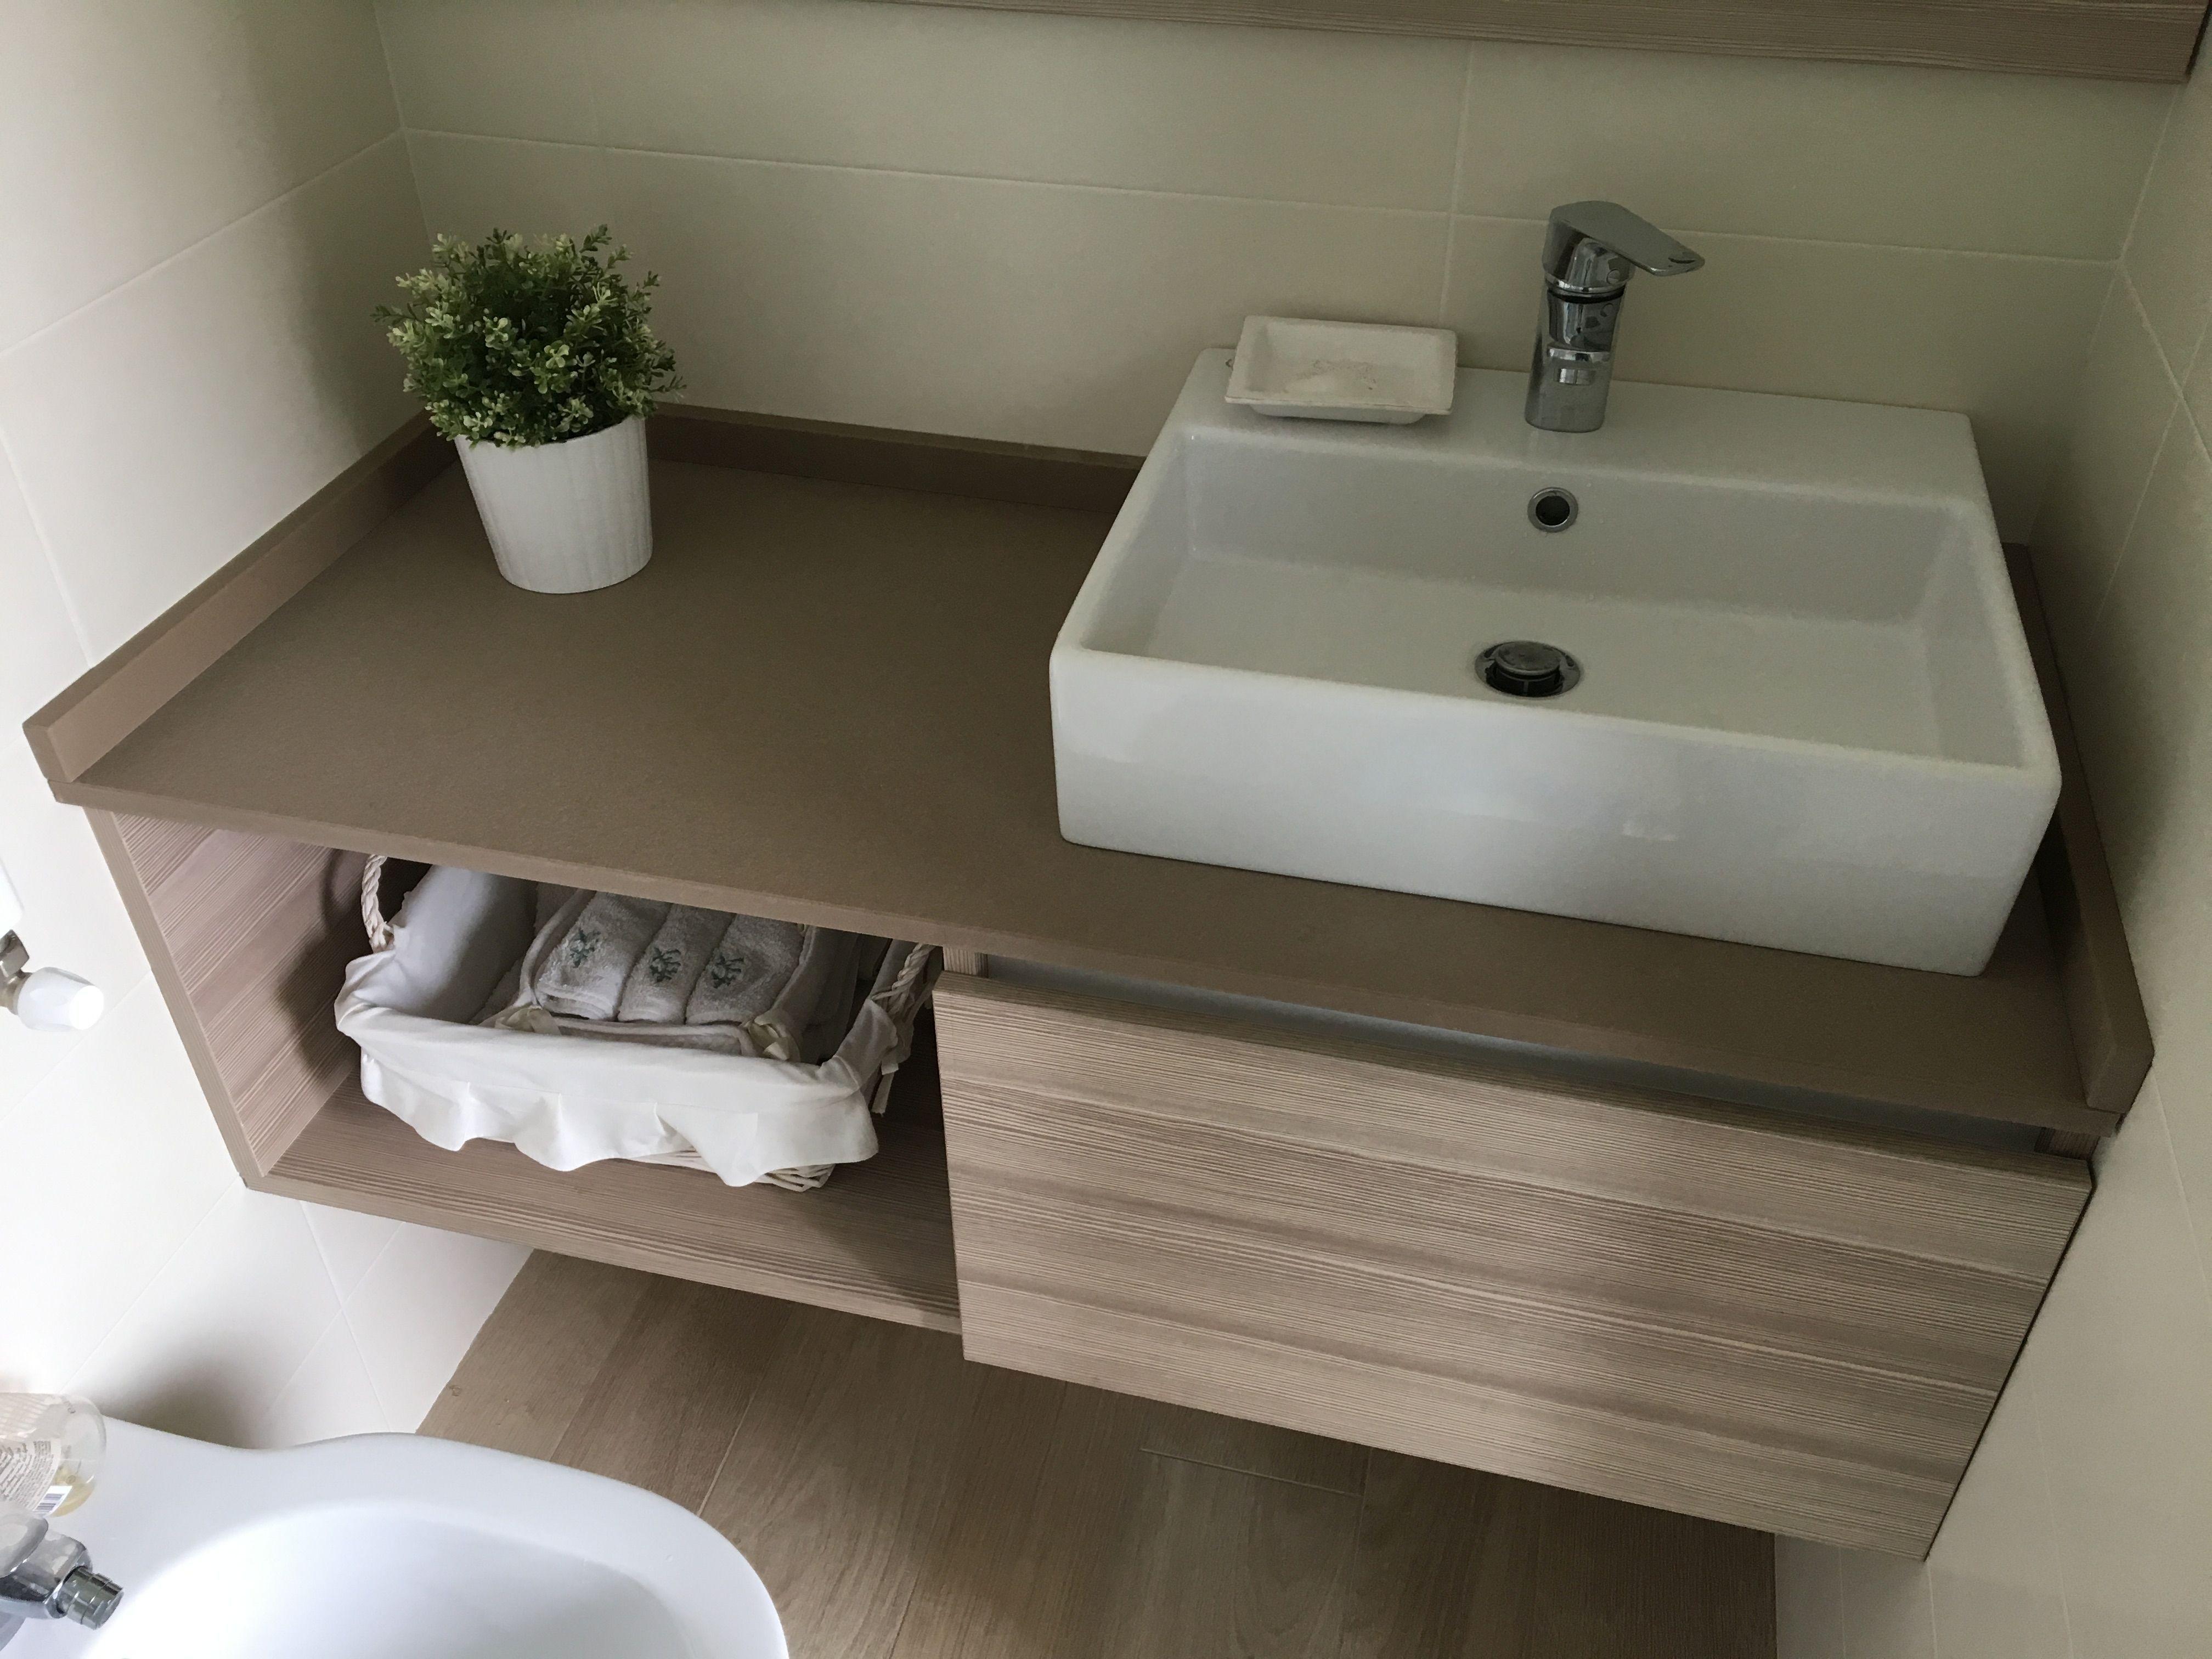 Mobile per bagno sospeso in laminato, top in quarzo ...